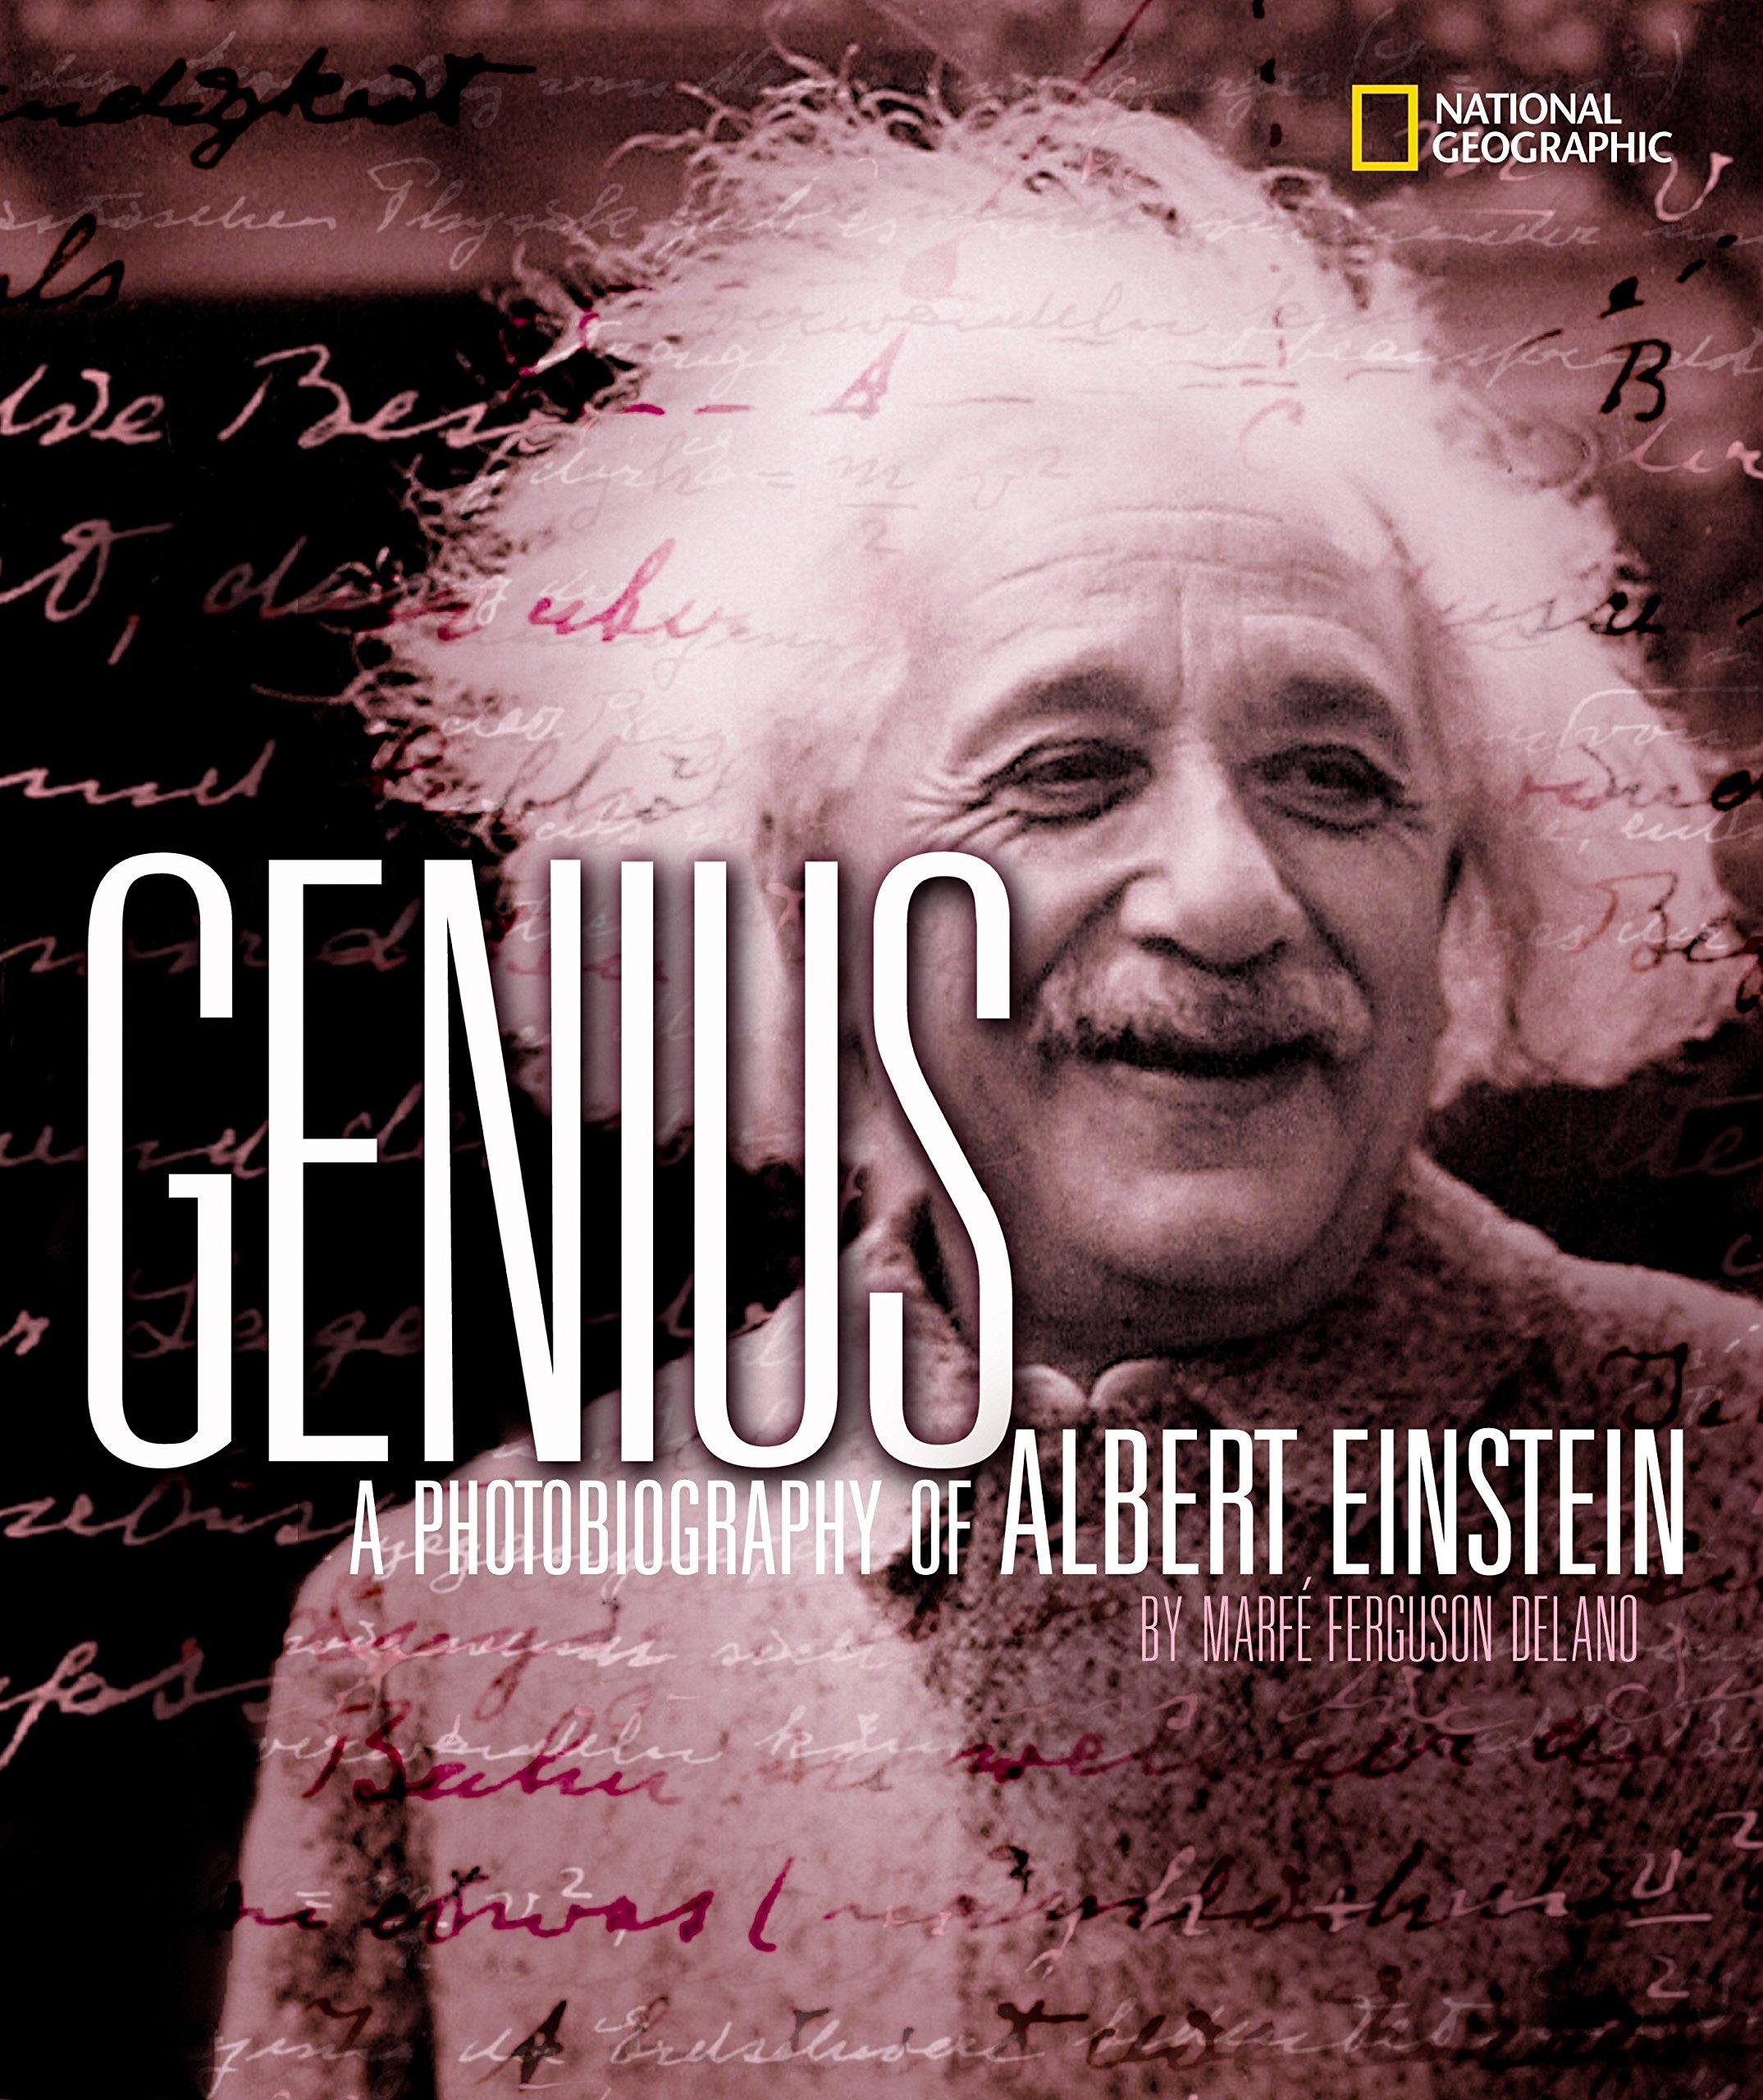 Genius: A Photobiography of Albert Einstein (Photobiographies) pdf